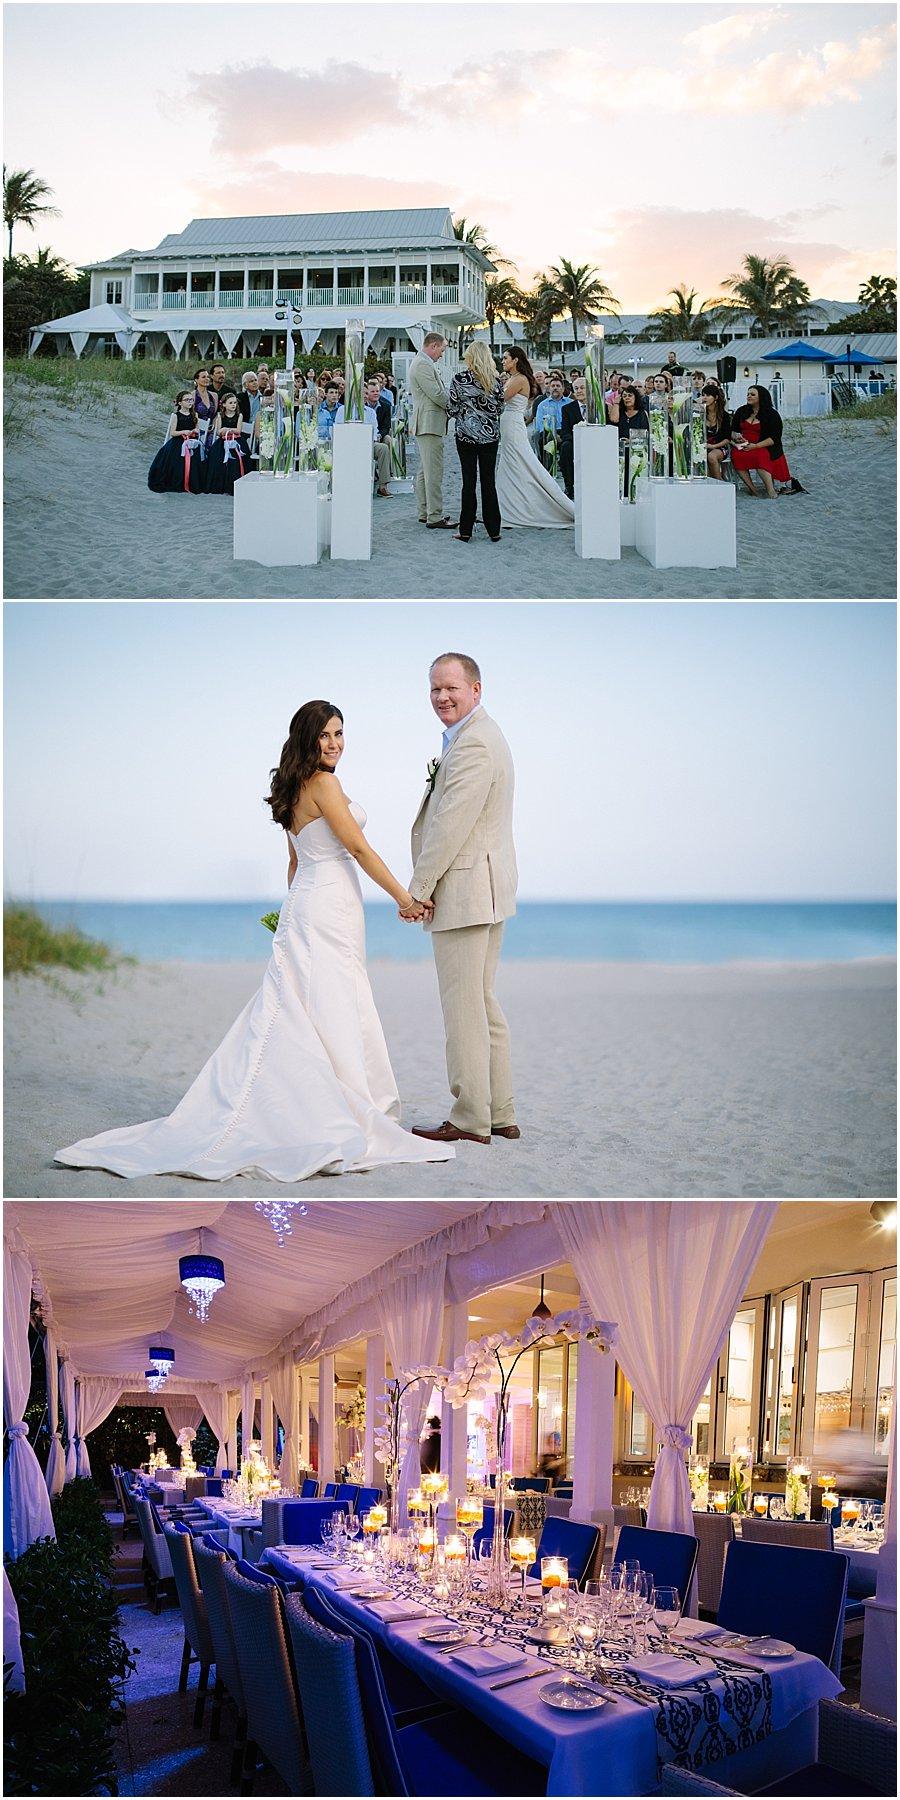 Palm Beach Wedding Venue_Seagate Hotel and Beach Club_The Harmons Photography